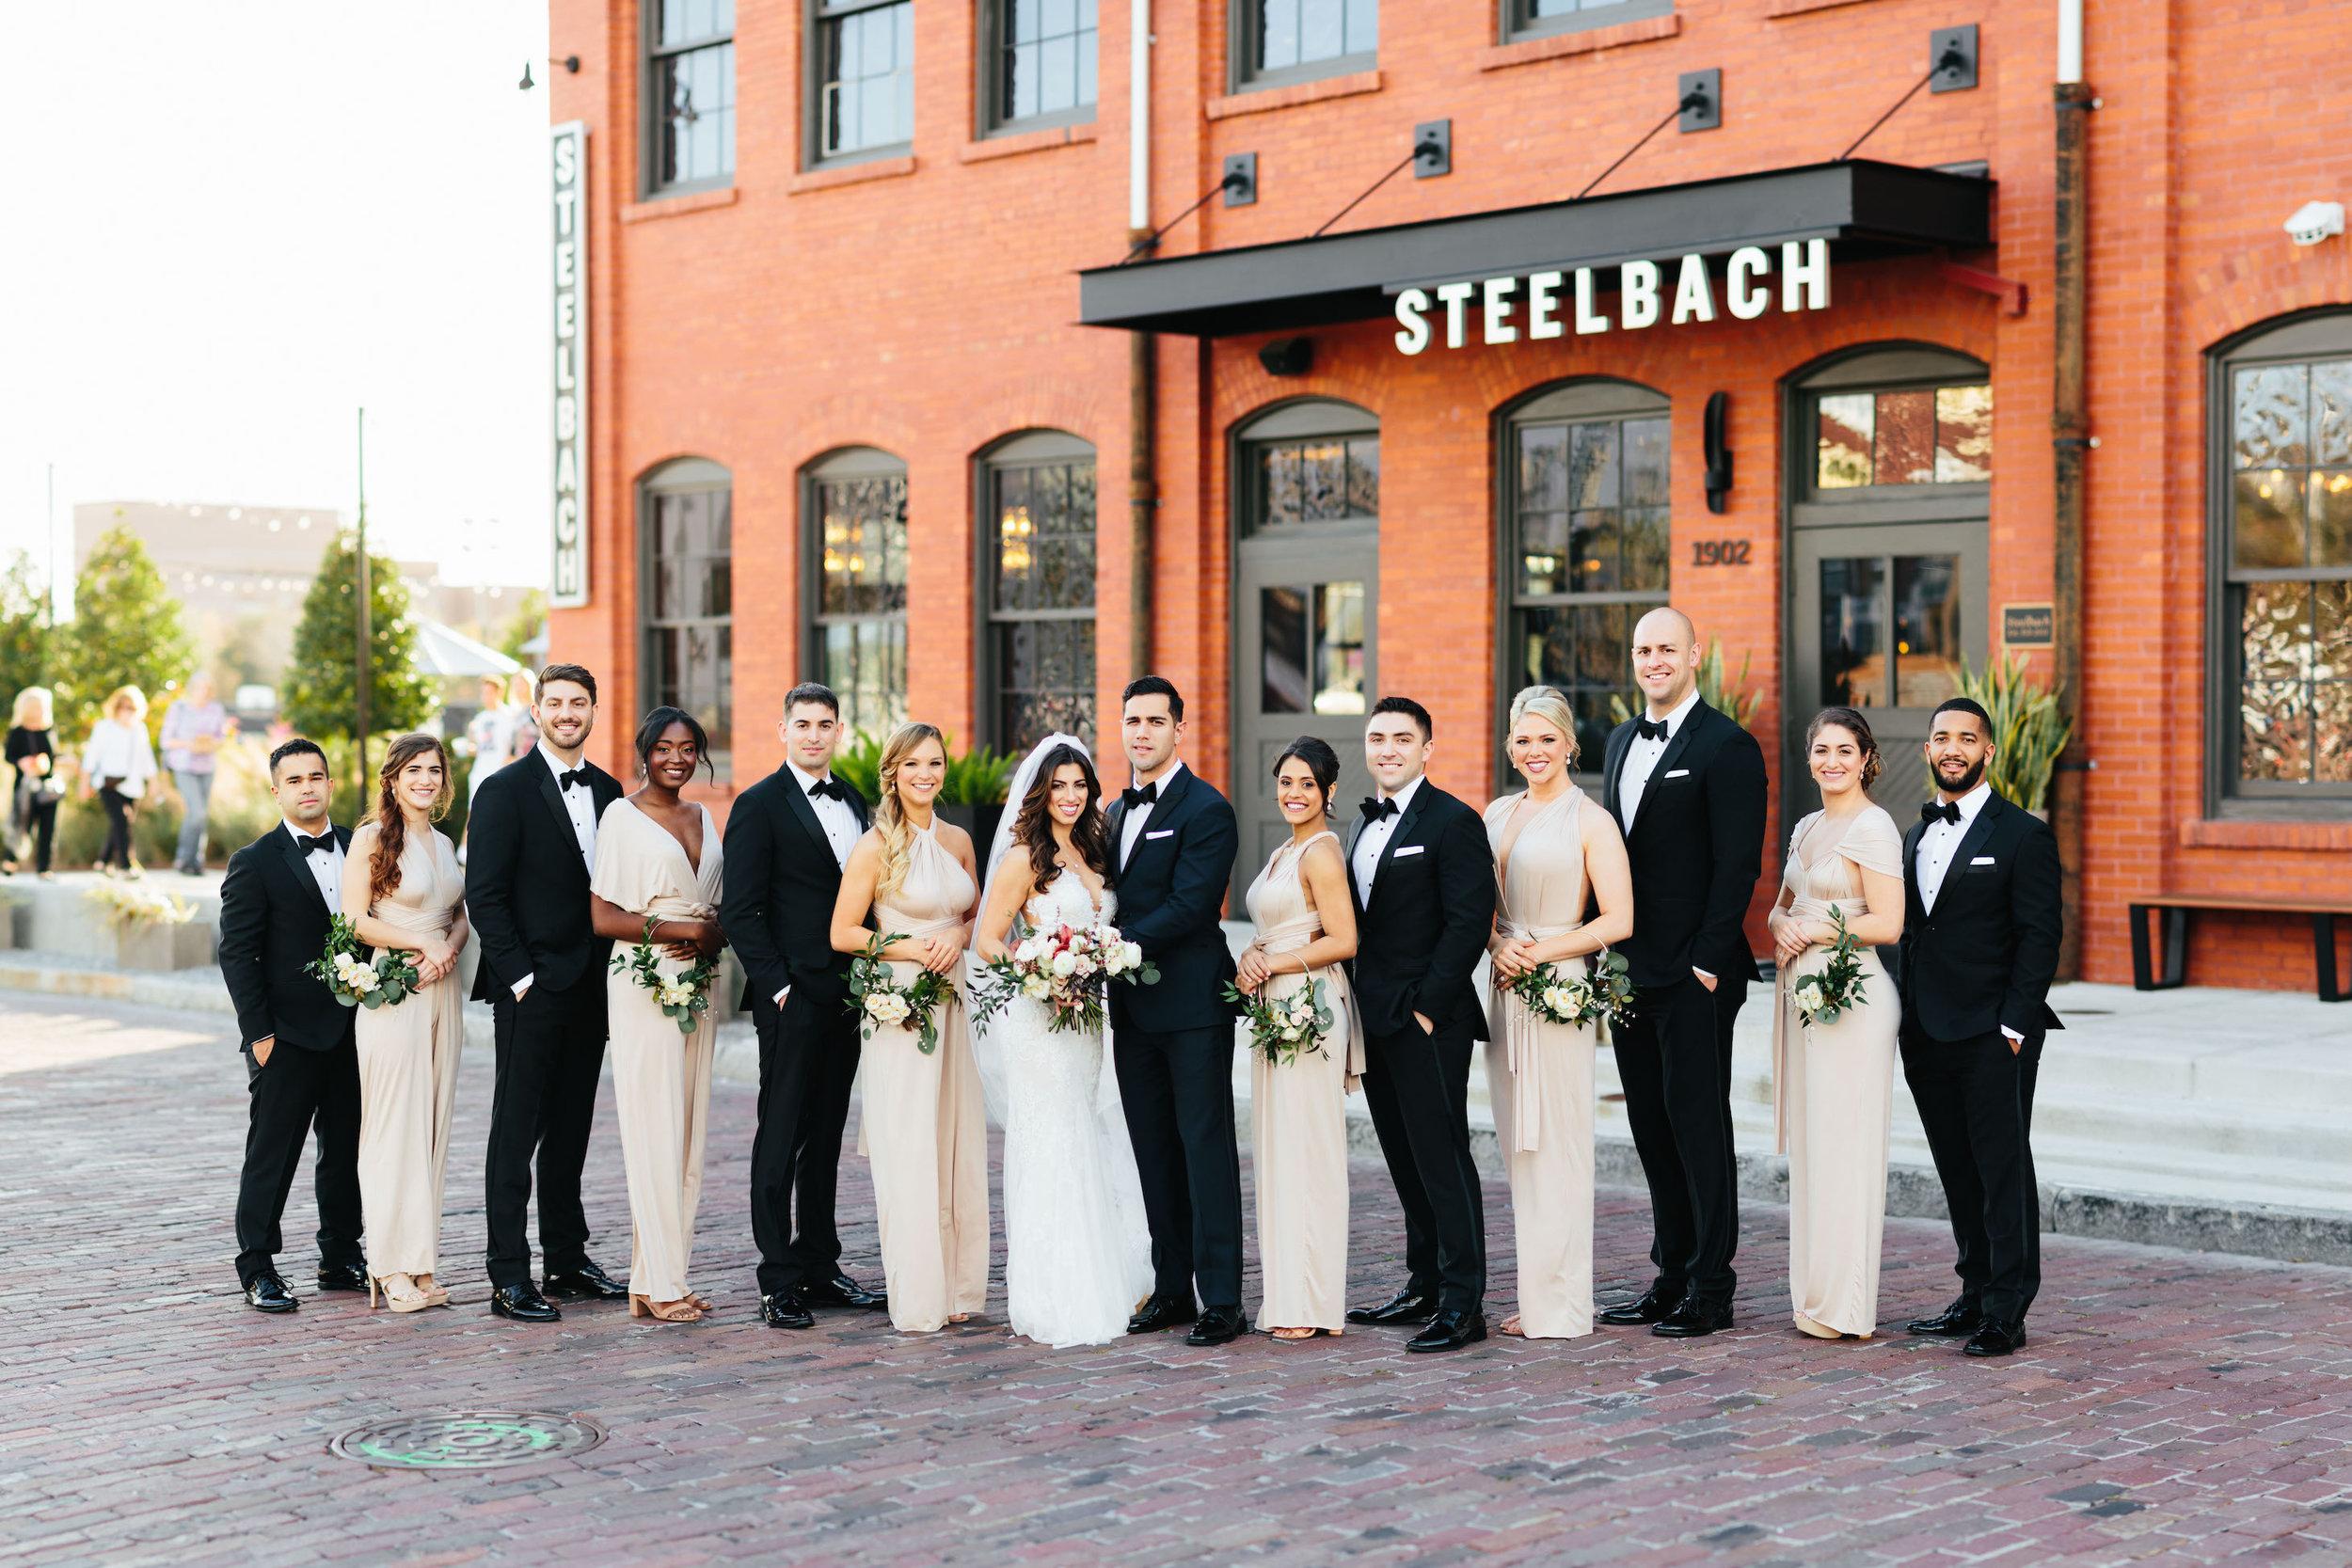 Full Bridal Party Photo Armature Works Wedding